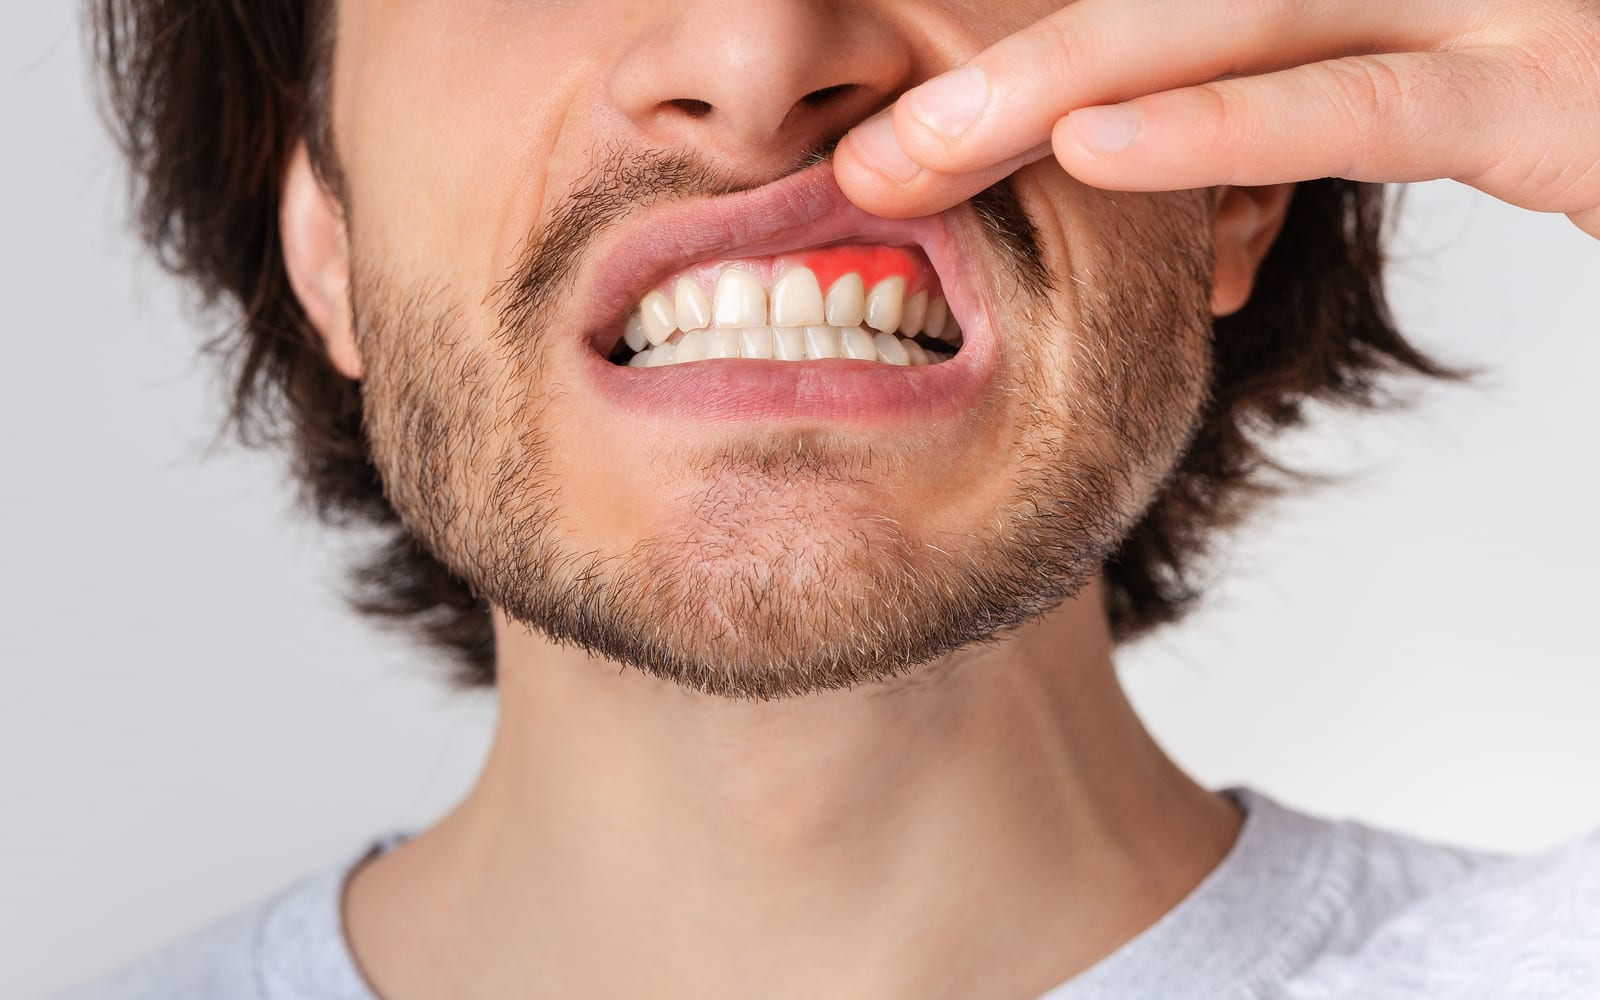 Man revealing gums with periodontal disease